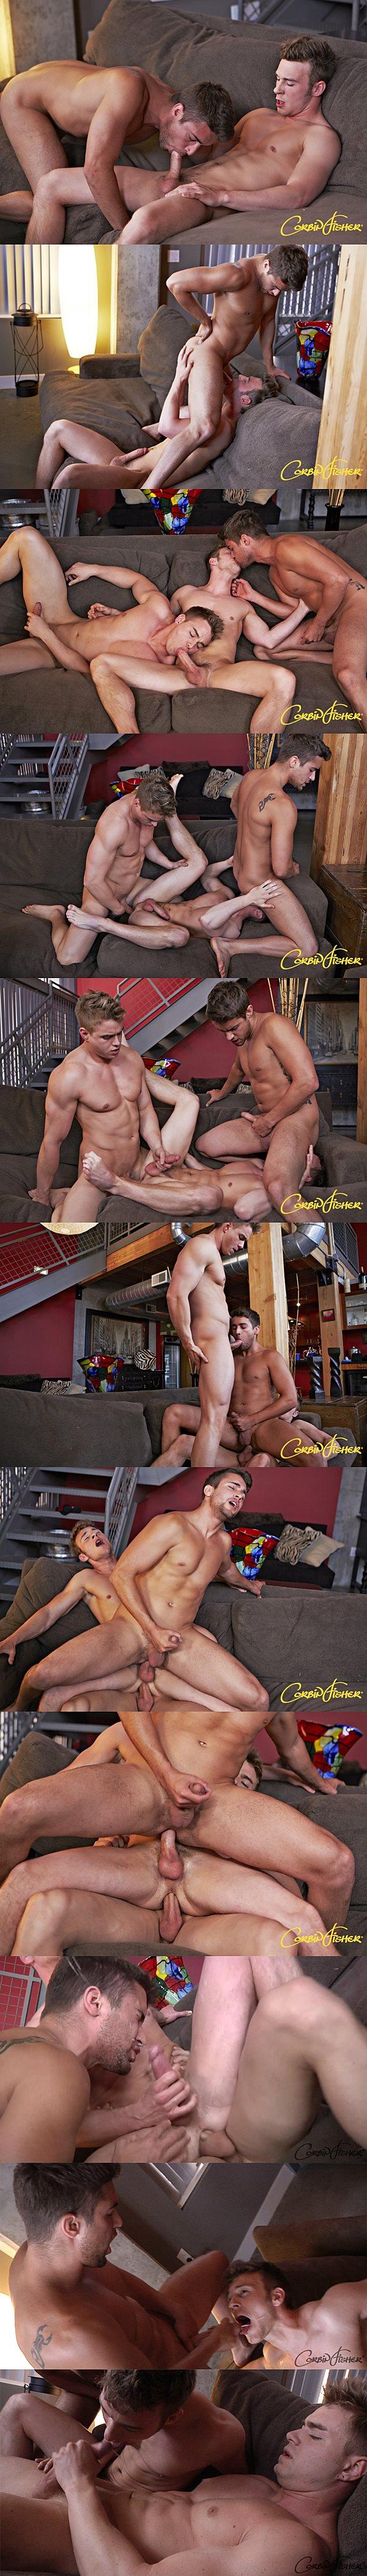 Muscle jock Connor barebacks Brayden & Zeb with three big cum facials in Kansas City: Connor's 3 Way at Corbinfisher 02